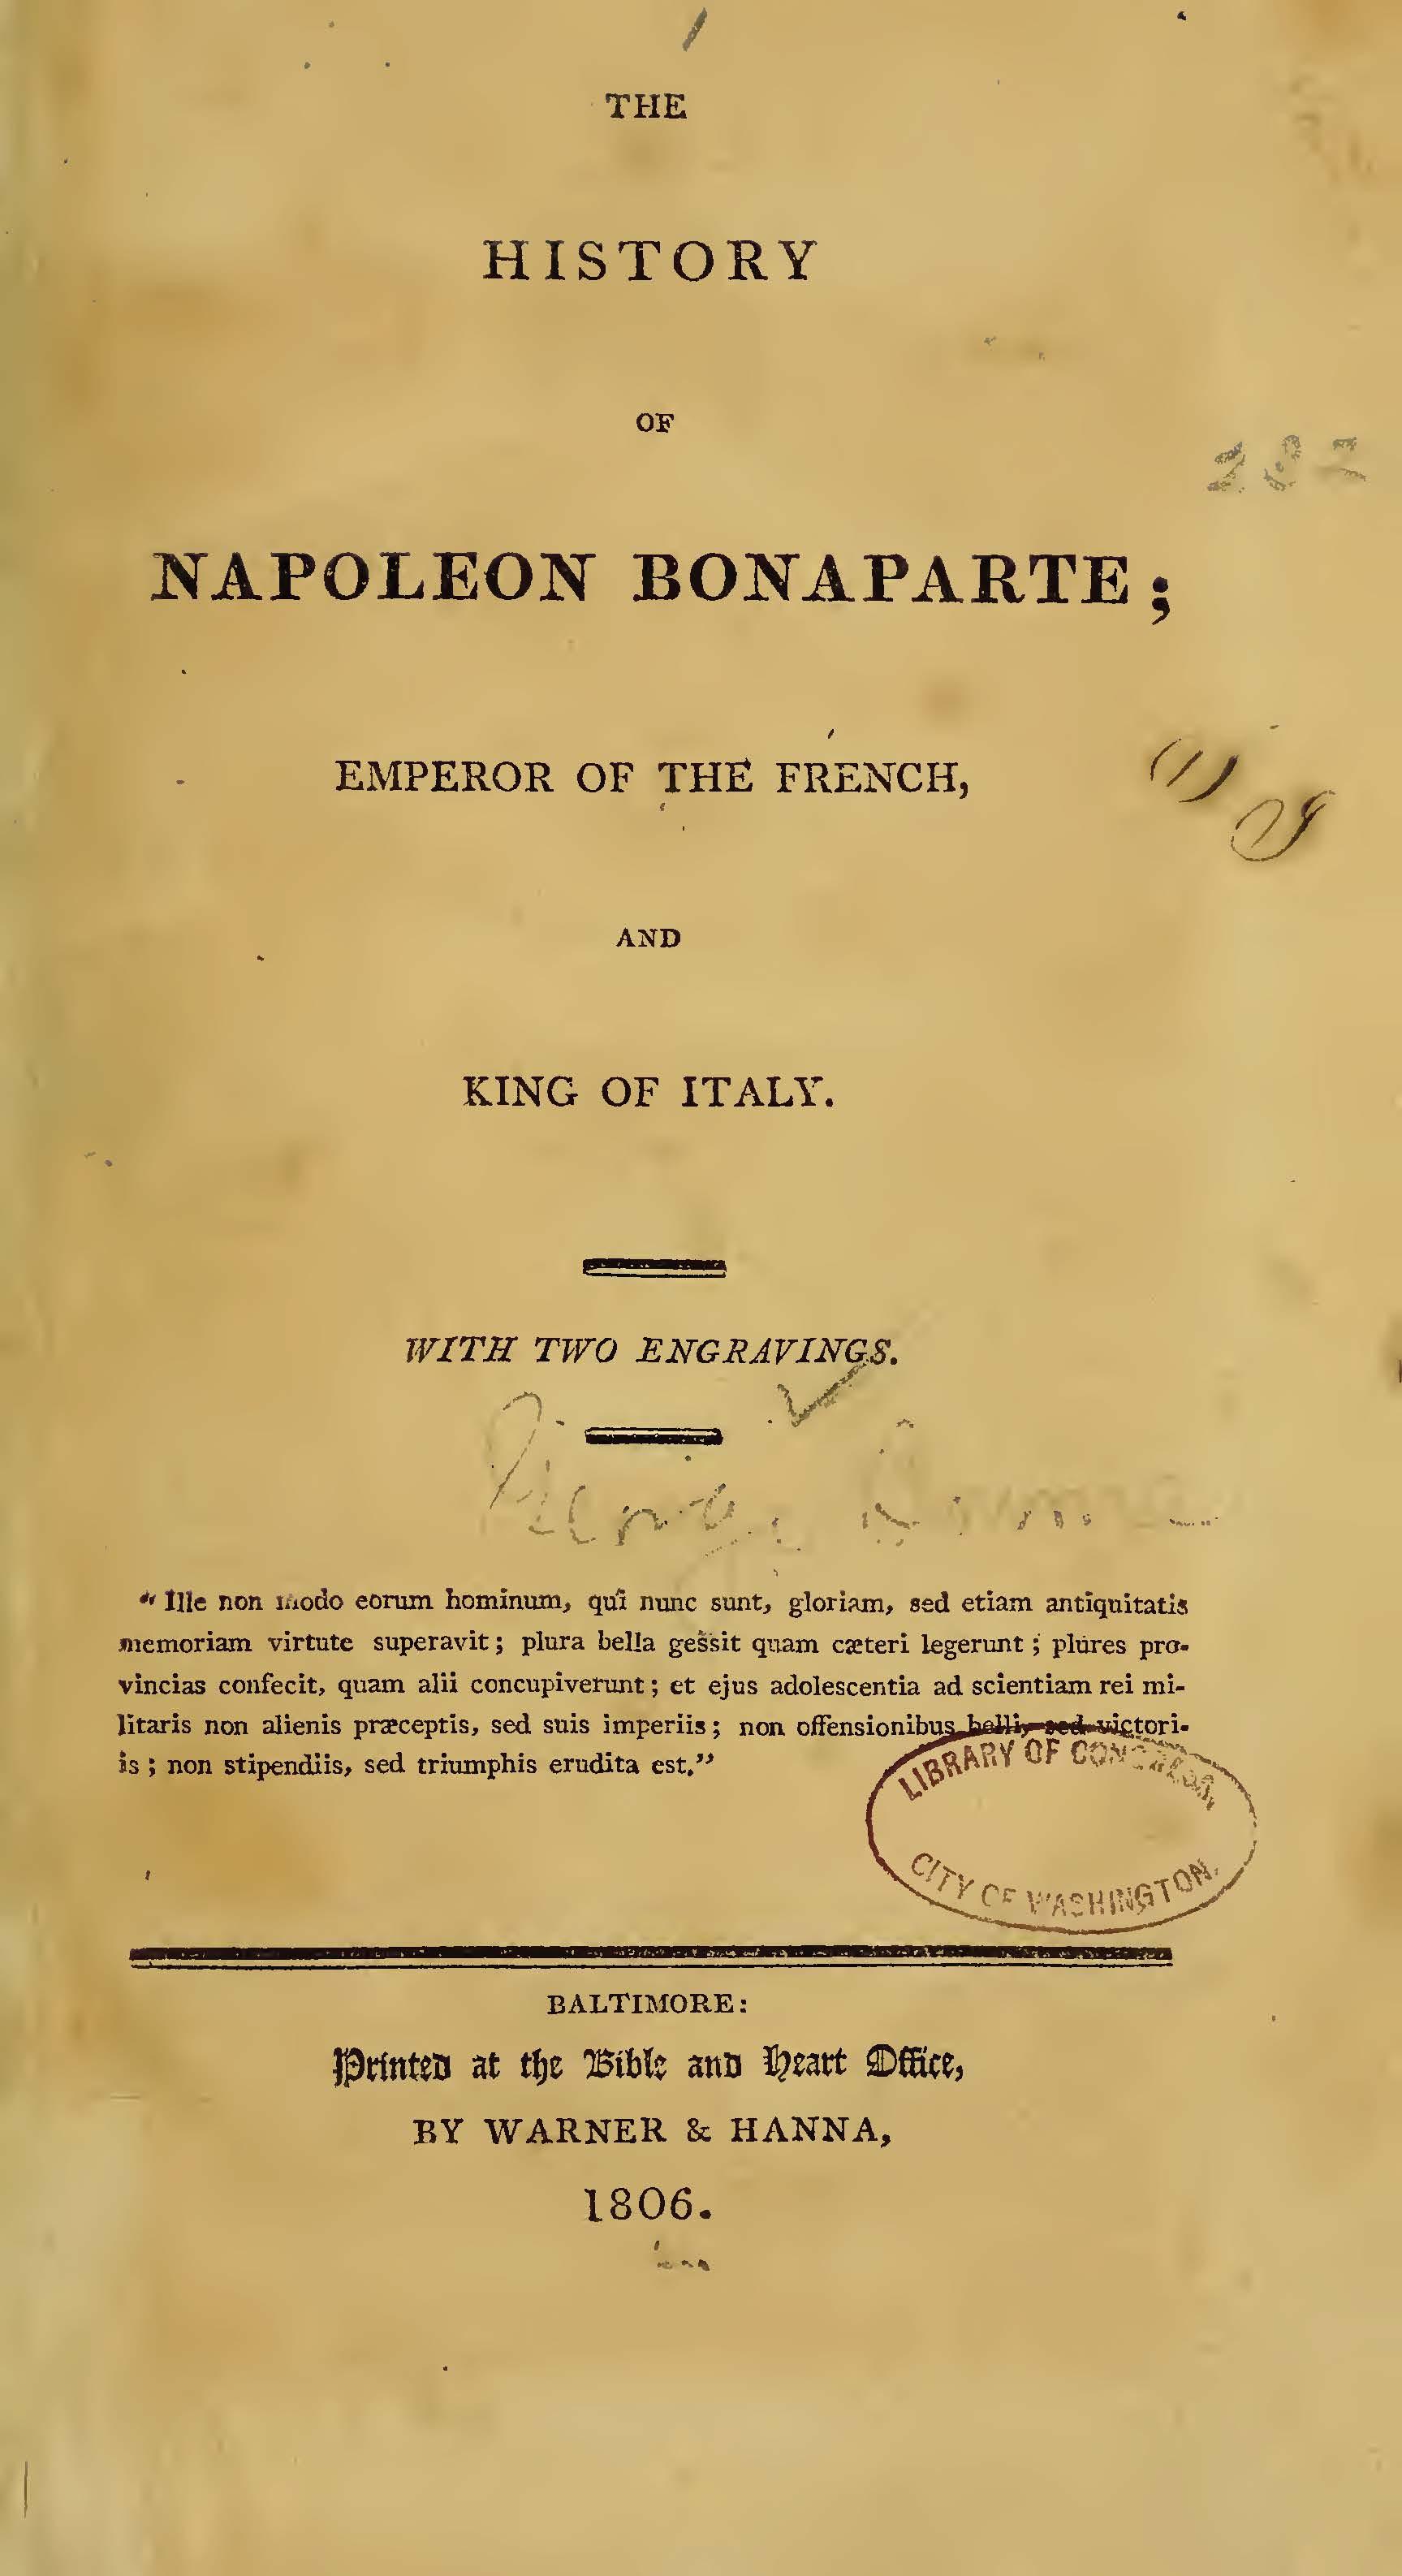 Bourne, George, The History of Napoleon Bonaparte Title Page.jpg